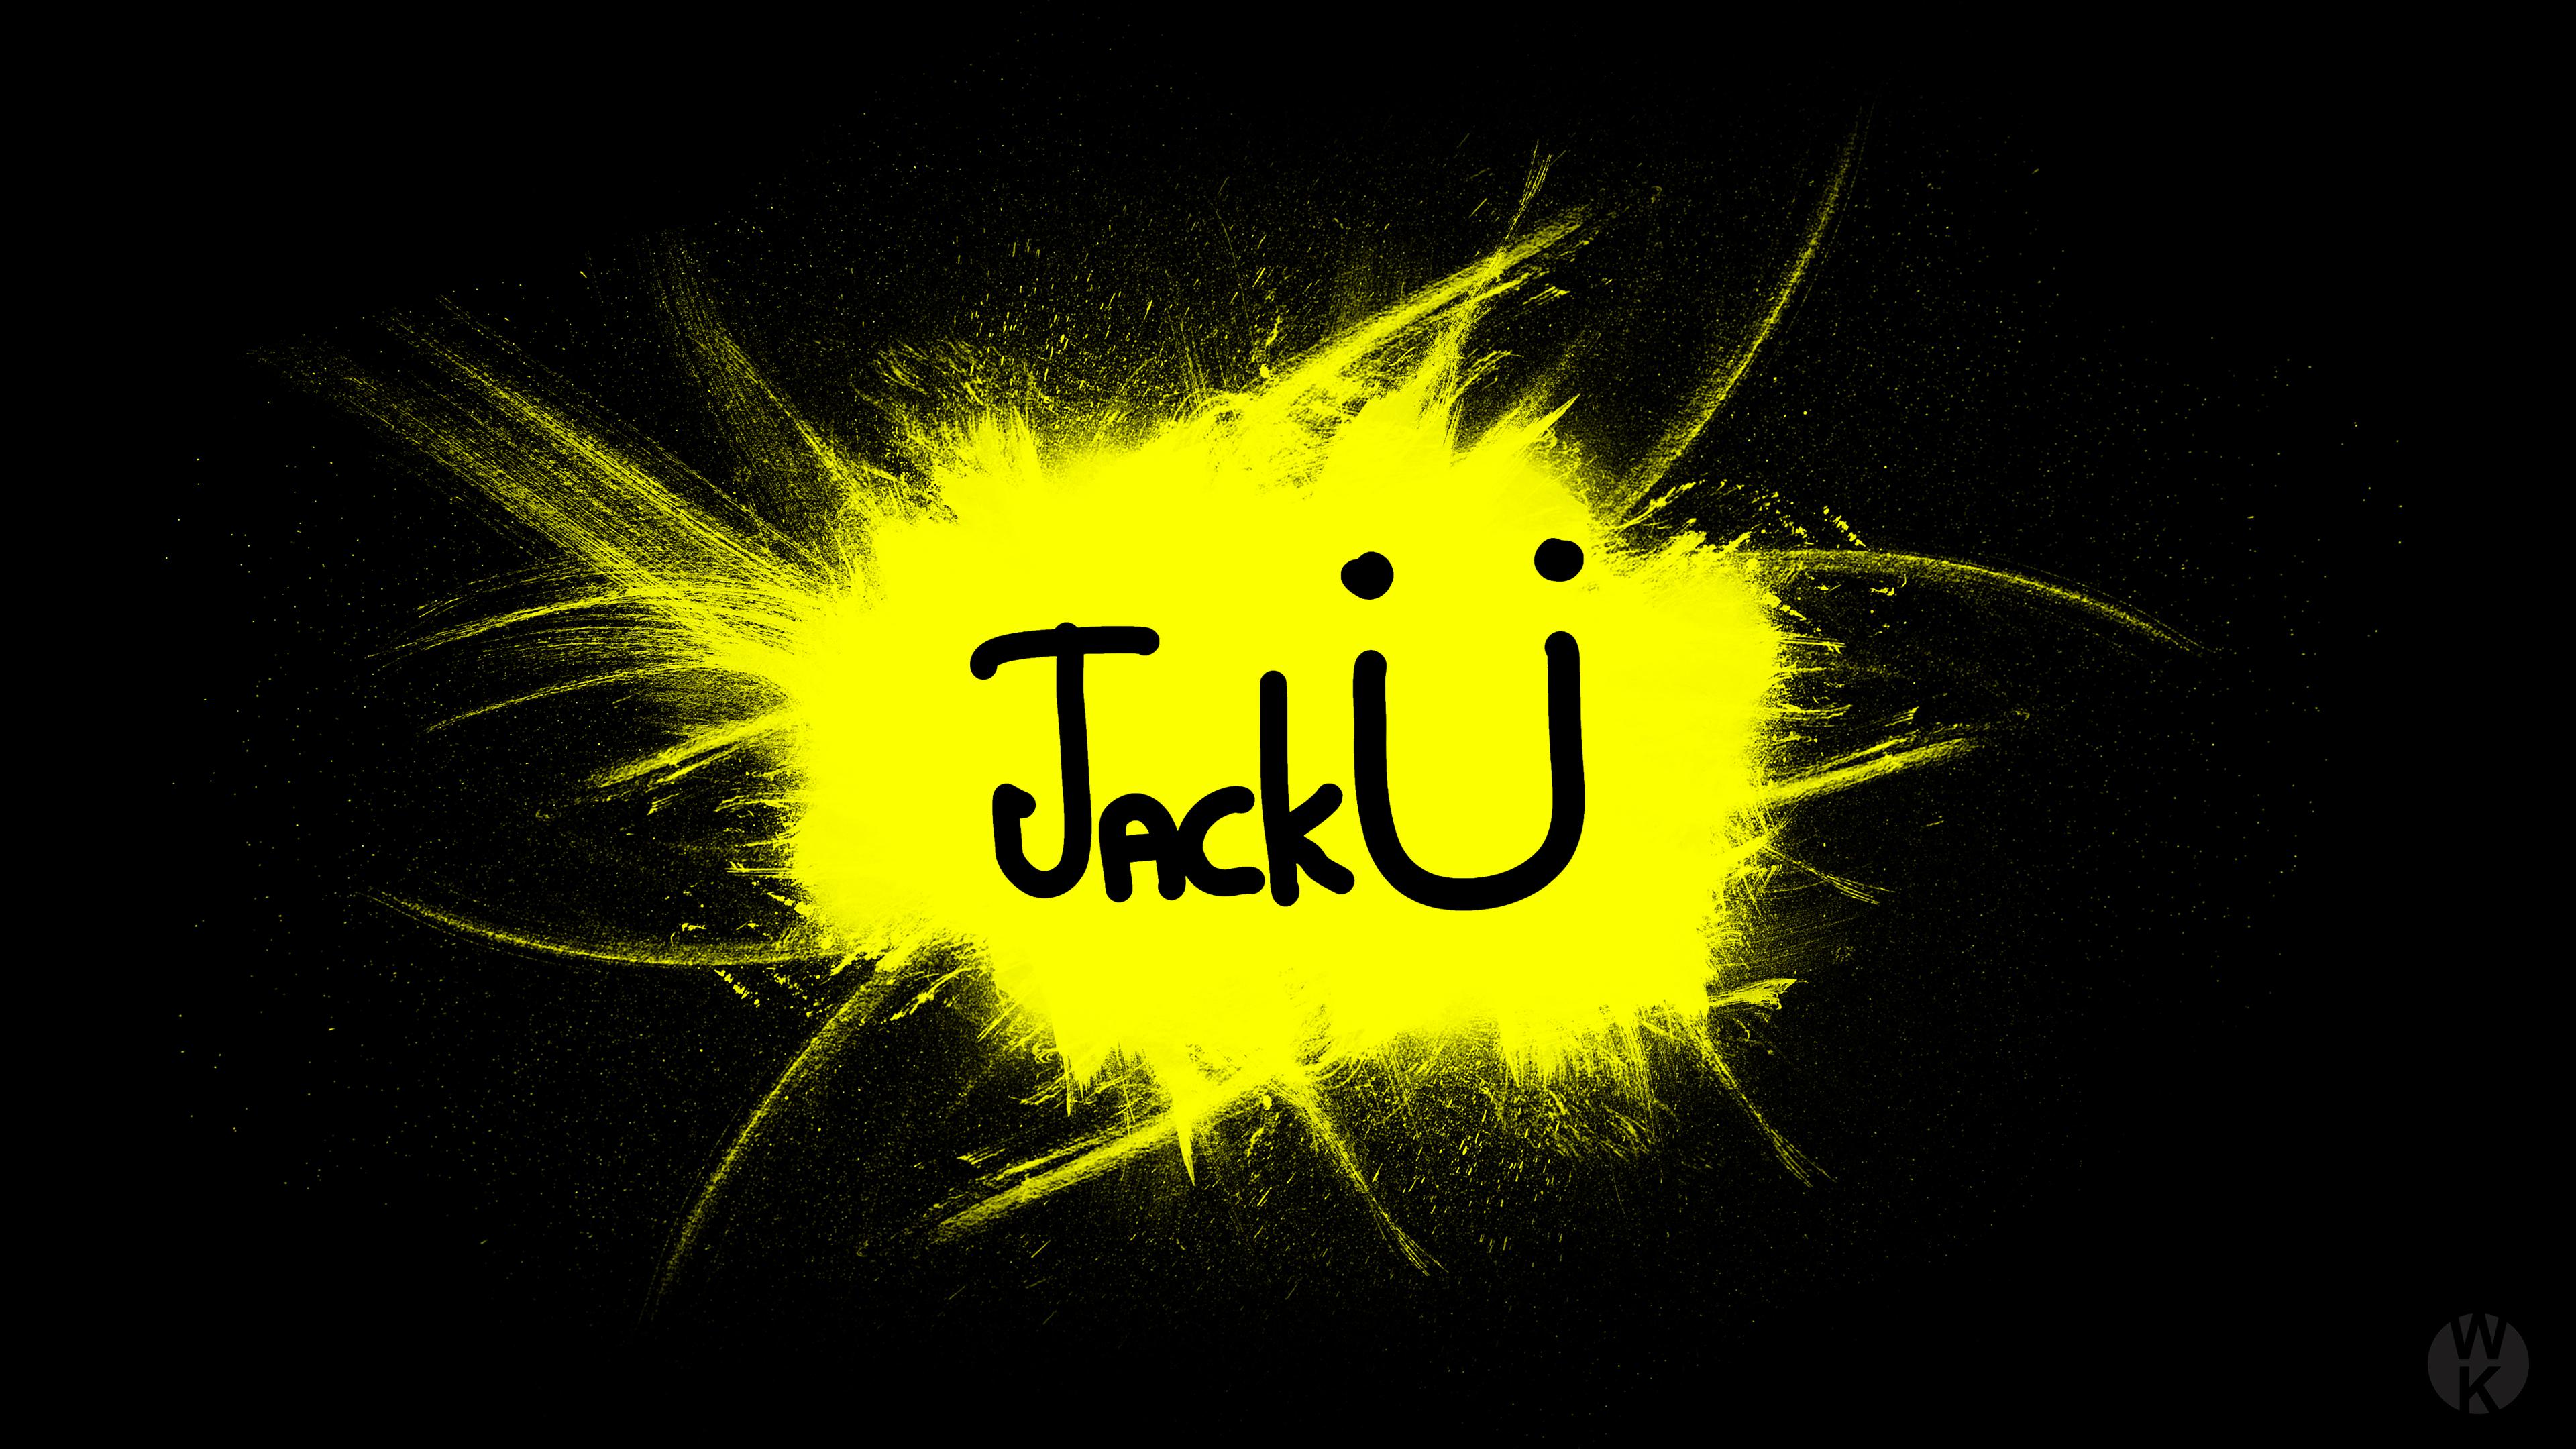 jack Ü 4k ultra hd wallpaper background image 3840x2160 id